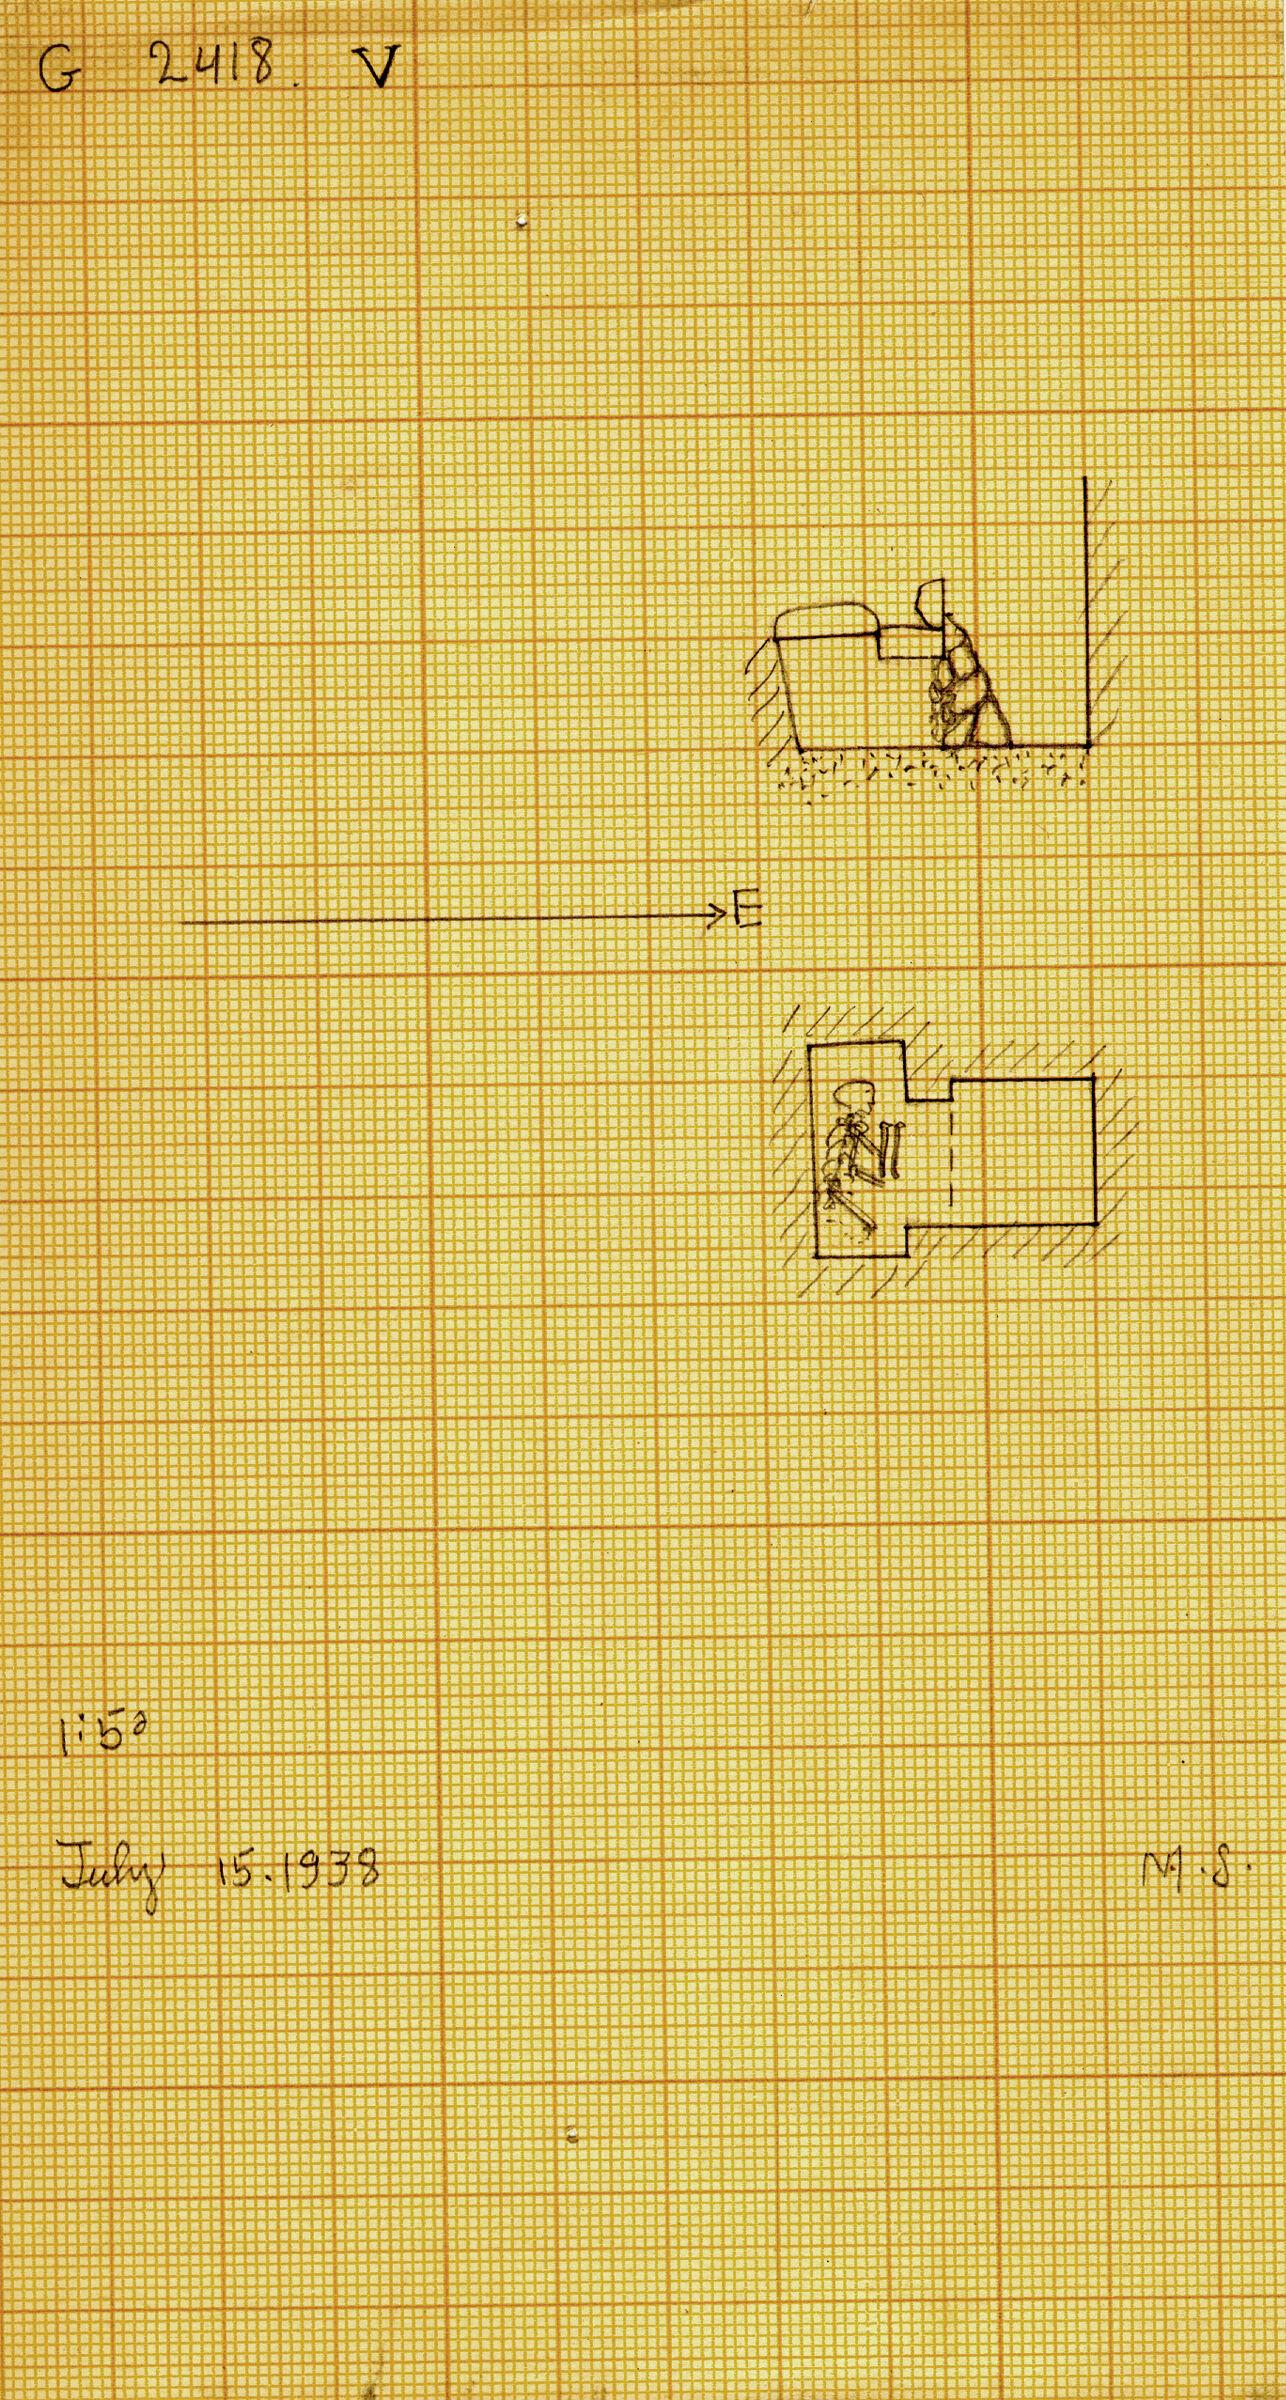 Maps and plans: G 2418, Shaft V